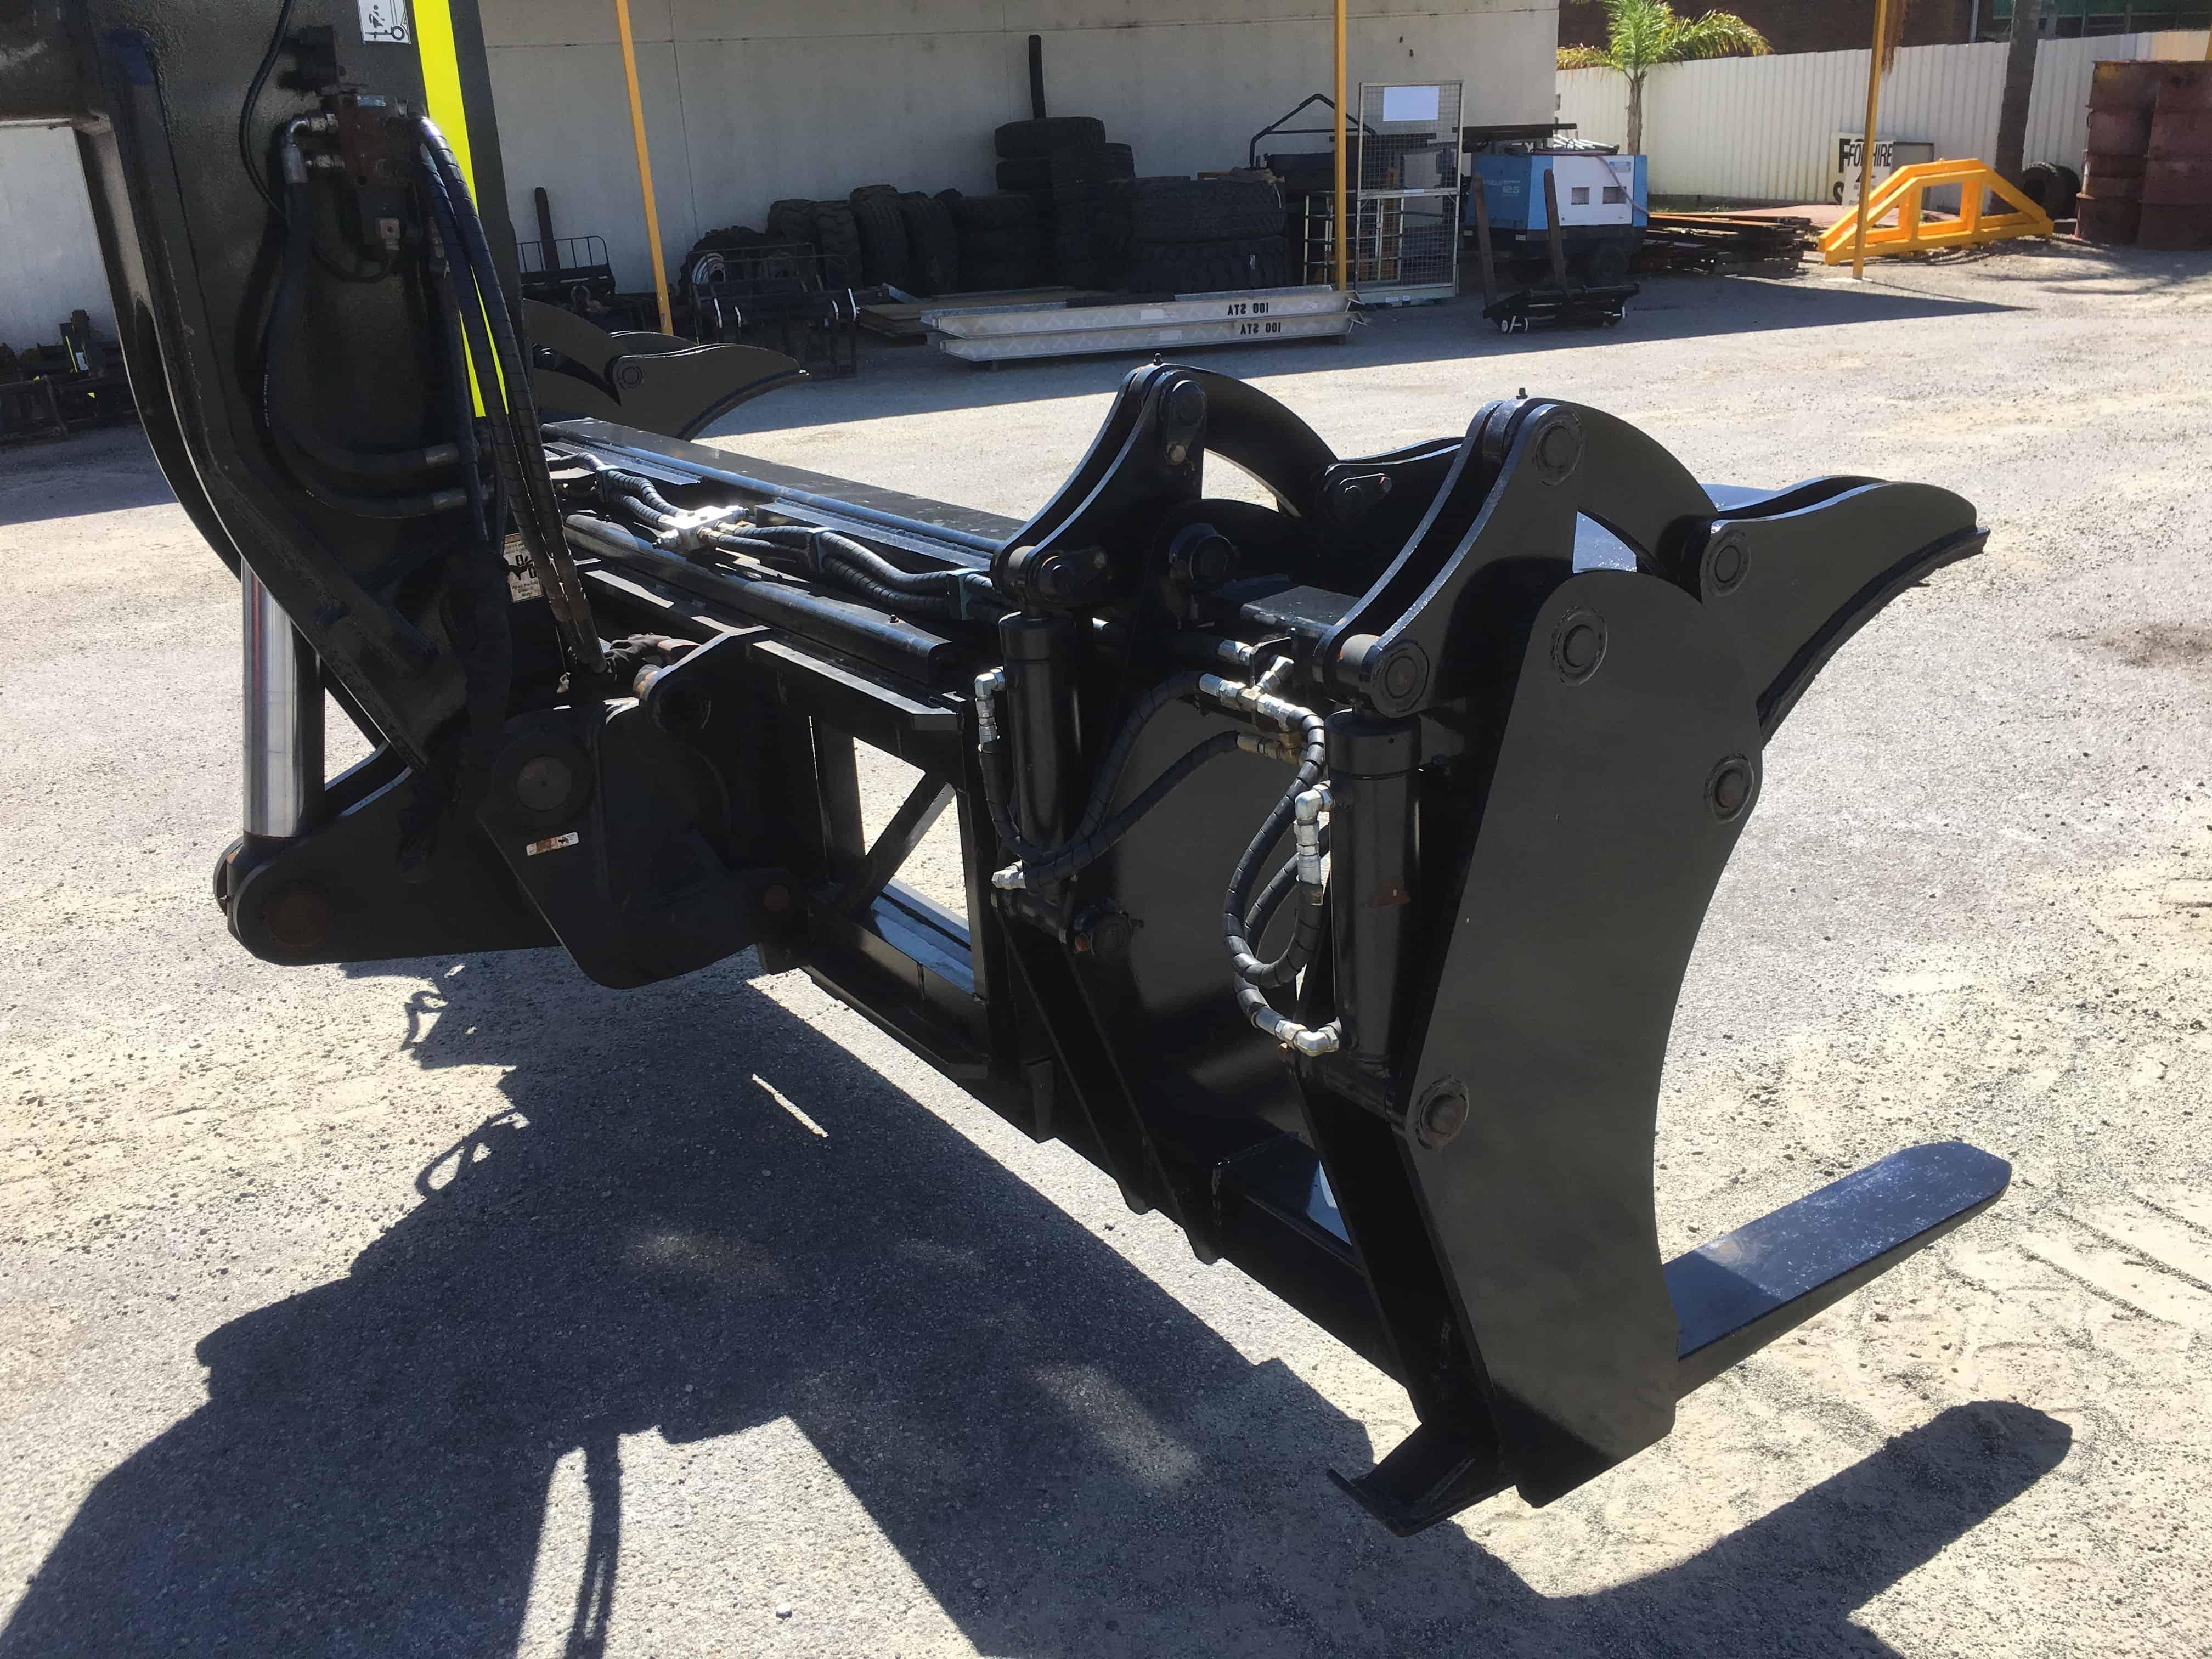 allterrain-services-access-hire-perth-best-crane-parts-for-sale